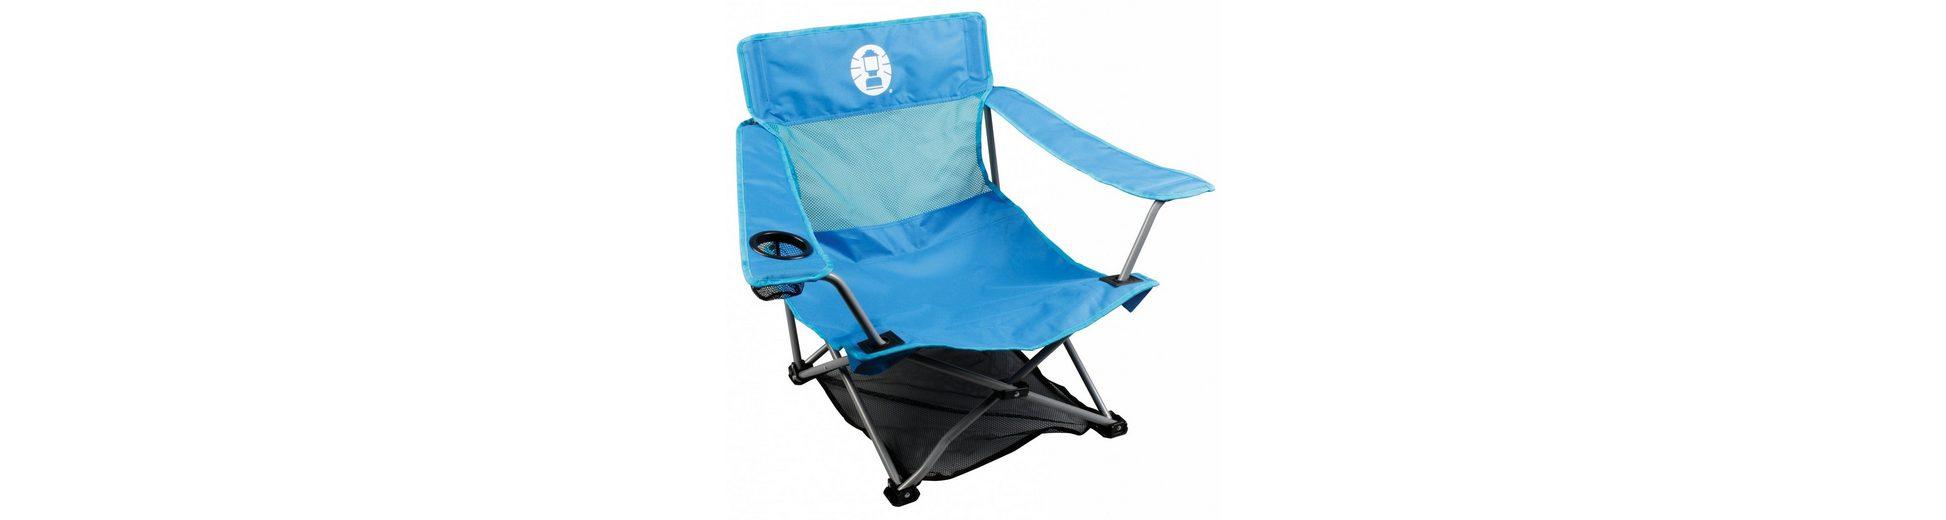 Coleman Camping-Stuhl »Low Quad Chair«